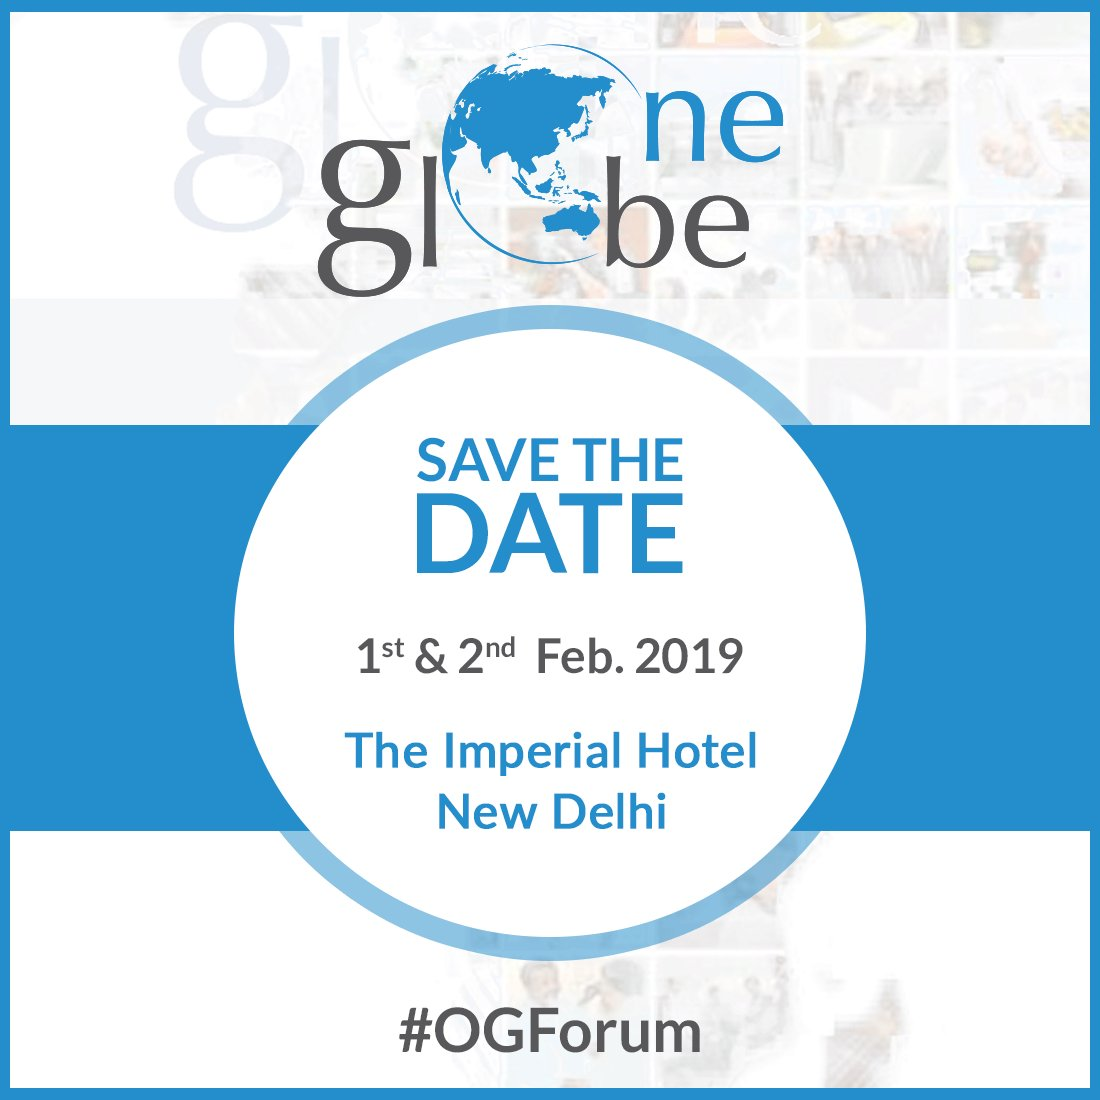 One Globe Forum 2019